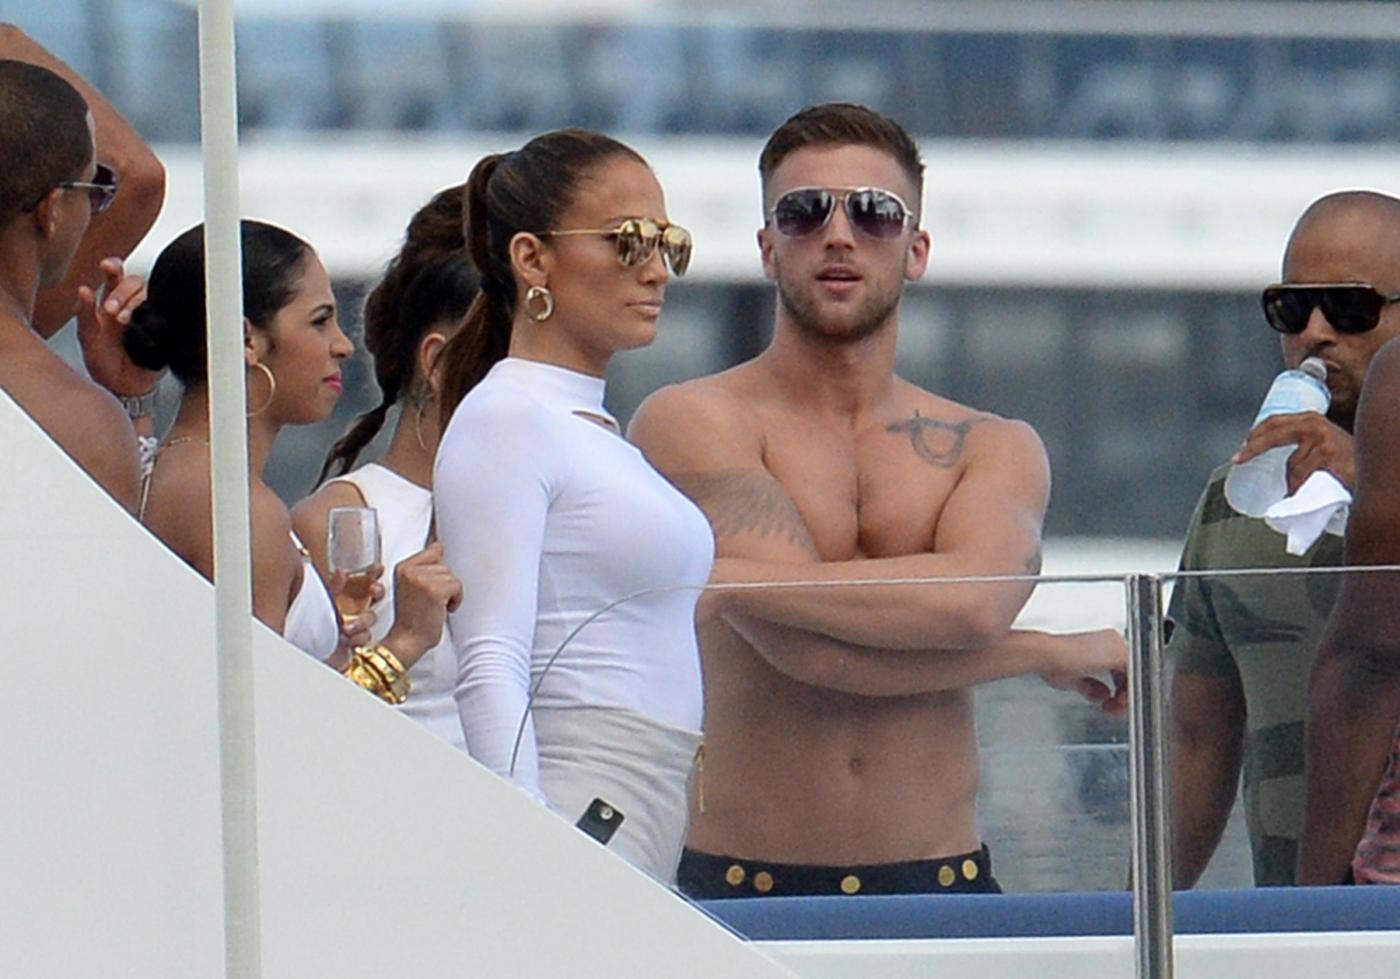 Jennifer Lopez Looks Sexy In White Hot Pants While Filming A Music Video In Miami Jennifer Lopez su uno yacht di lusso a Miami06